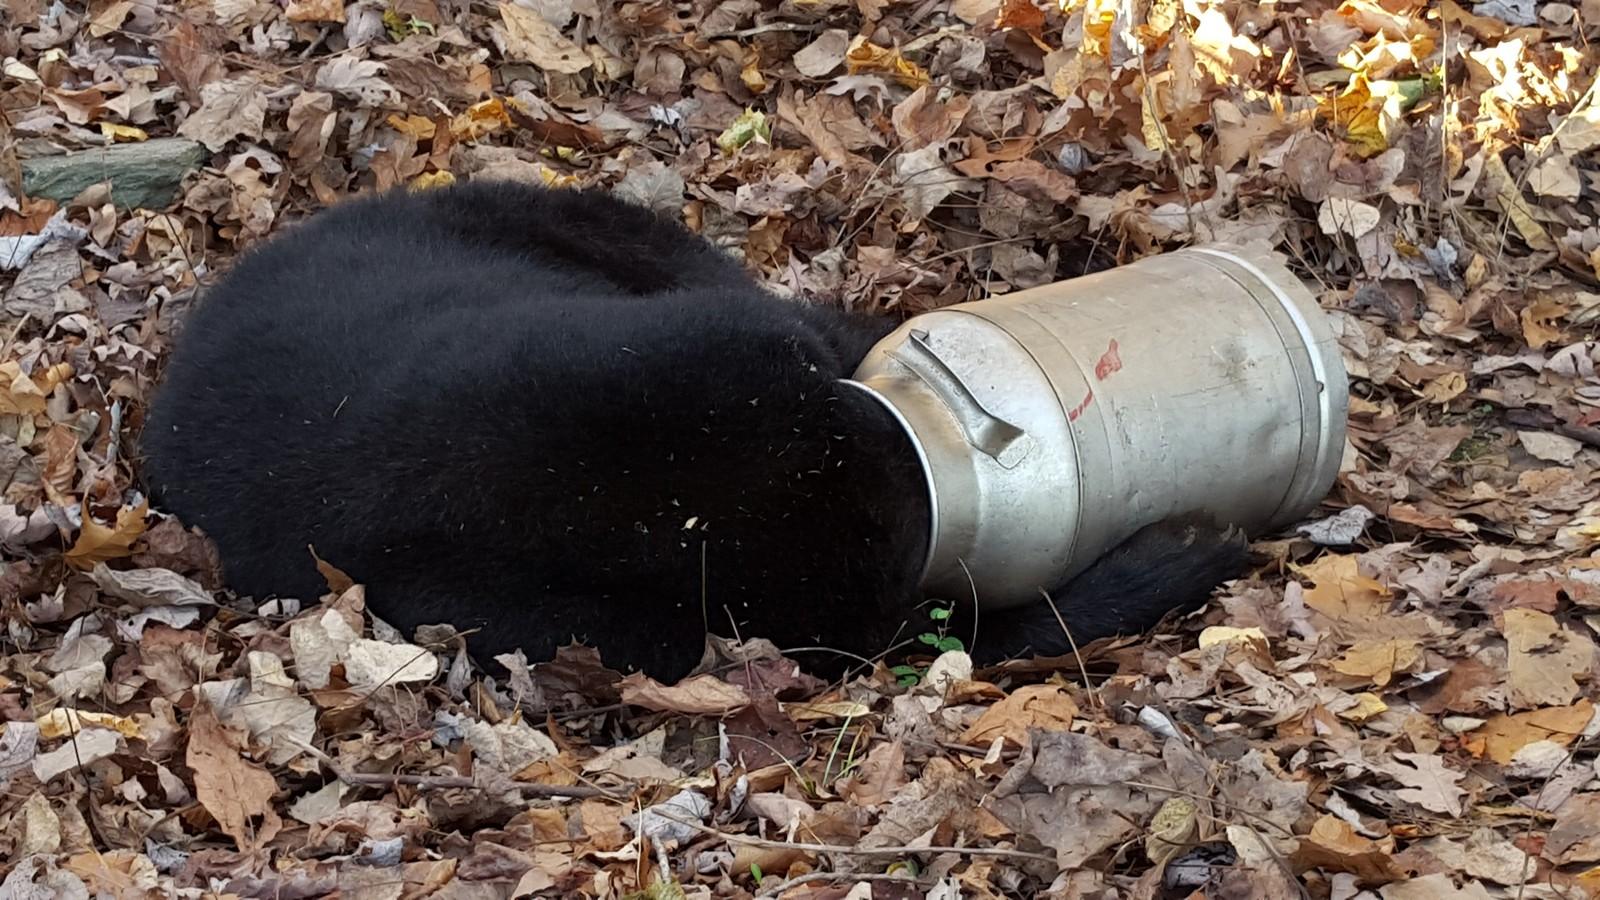 En svartbjørn var sugen på melk da den satte hodet fast i tønna. Amerikanske parkvakter måtte bedøve bjørnen og sage tønna av hodet, før den forlot området tilsynelatende uskadd.